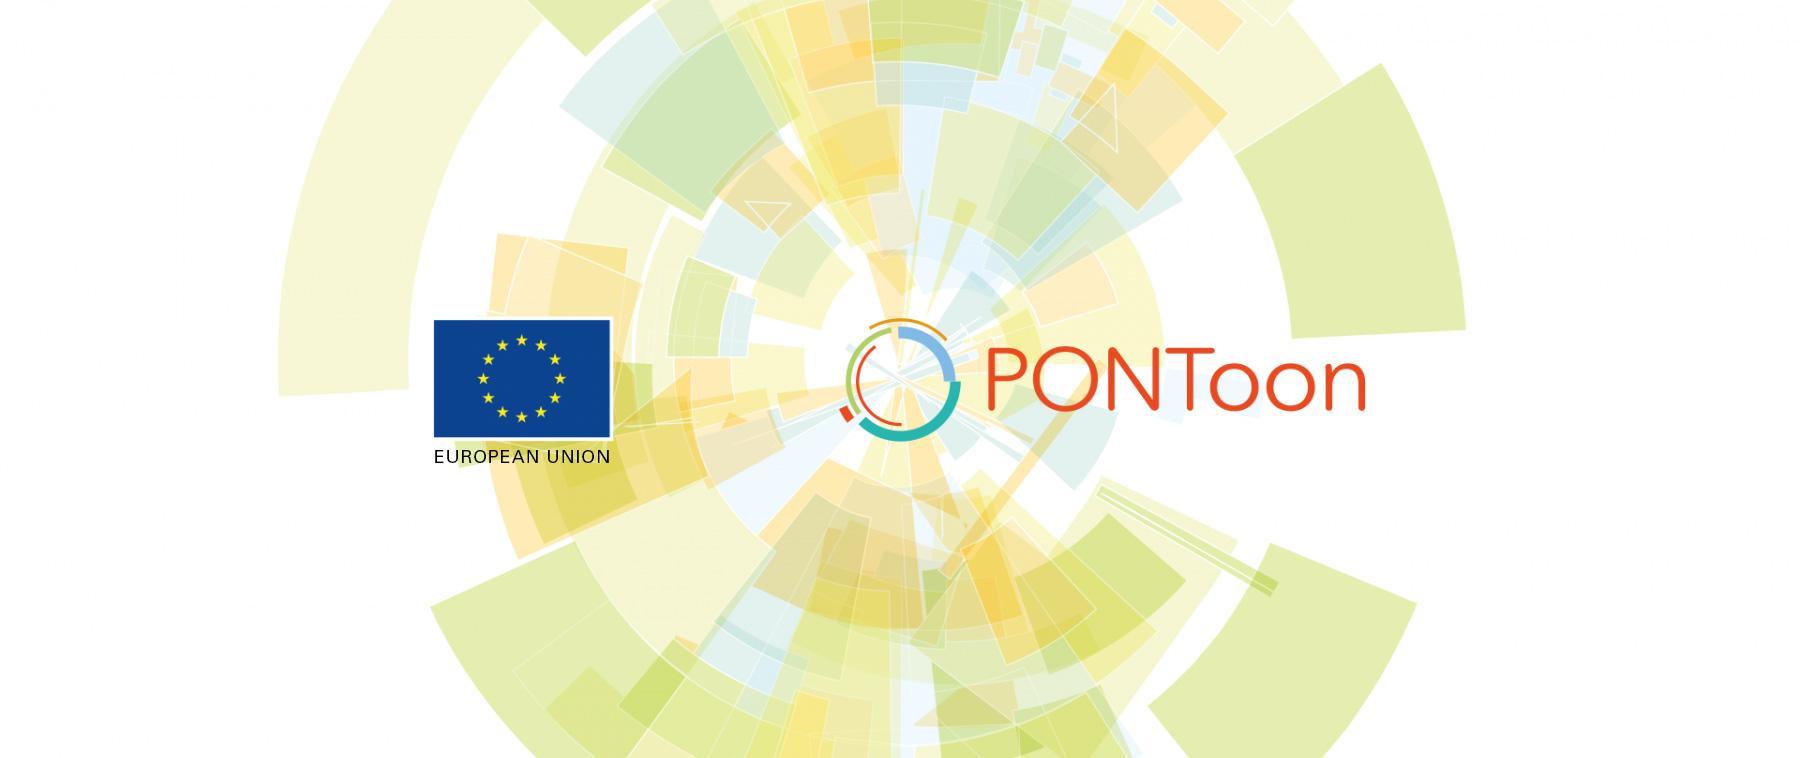 PONToon project